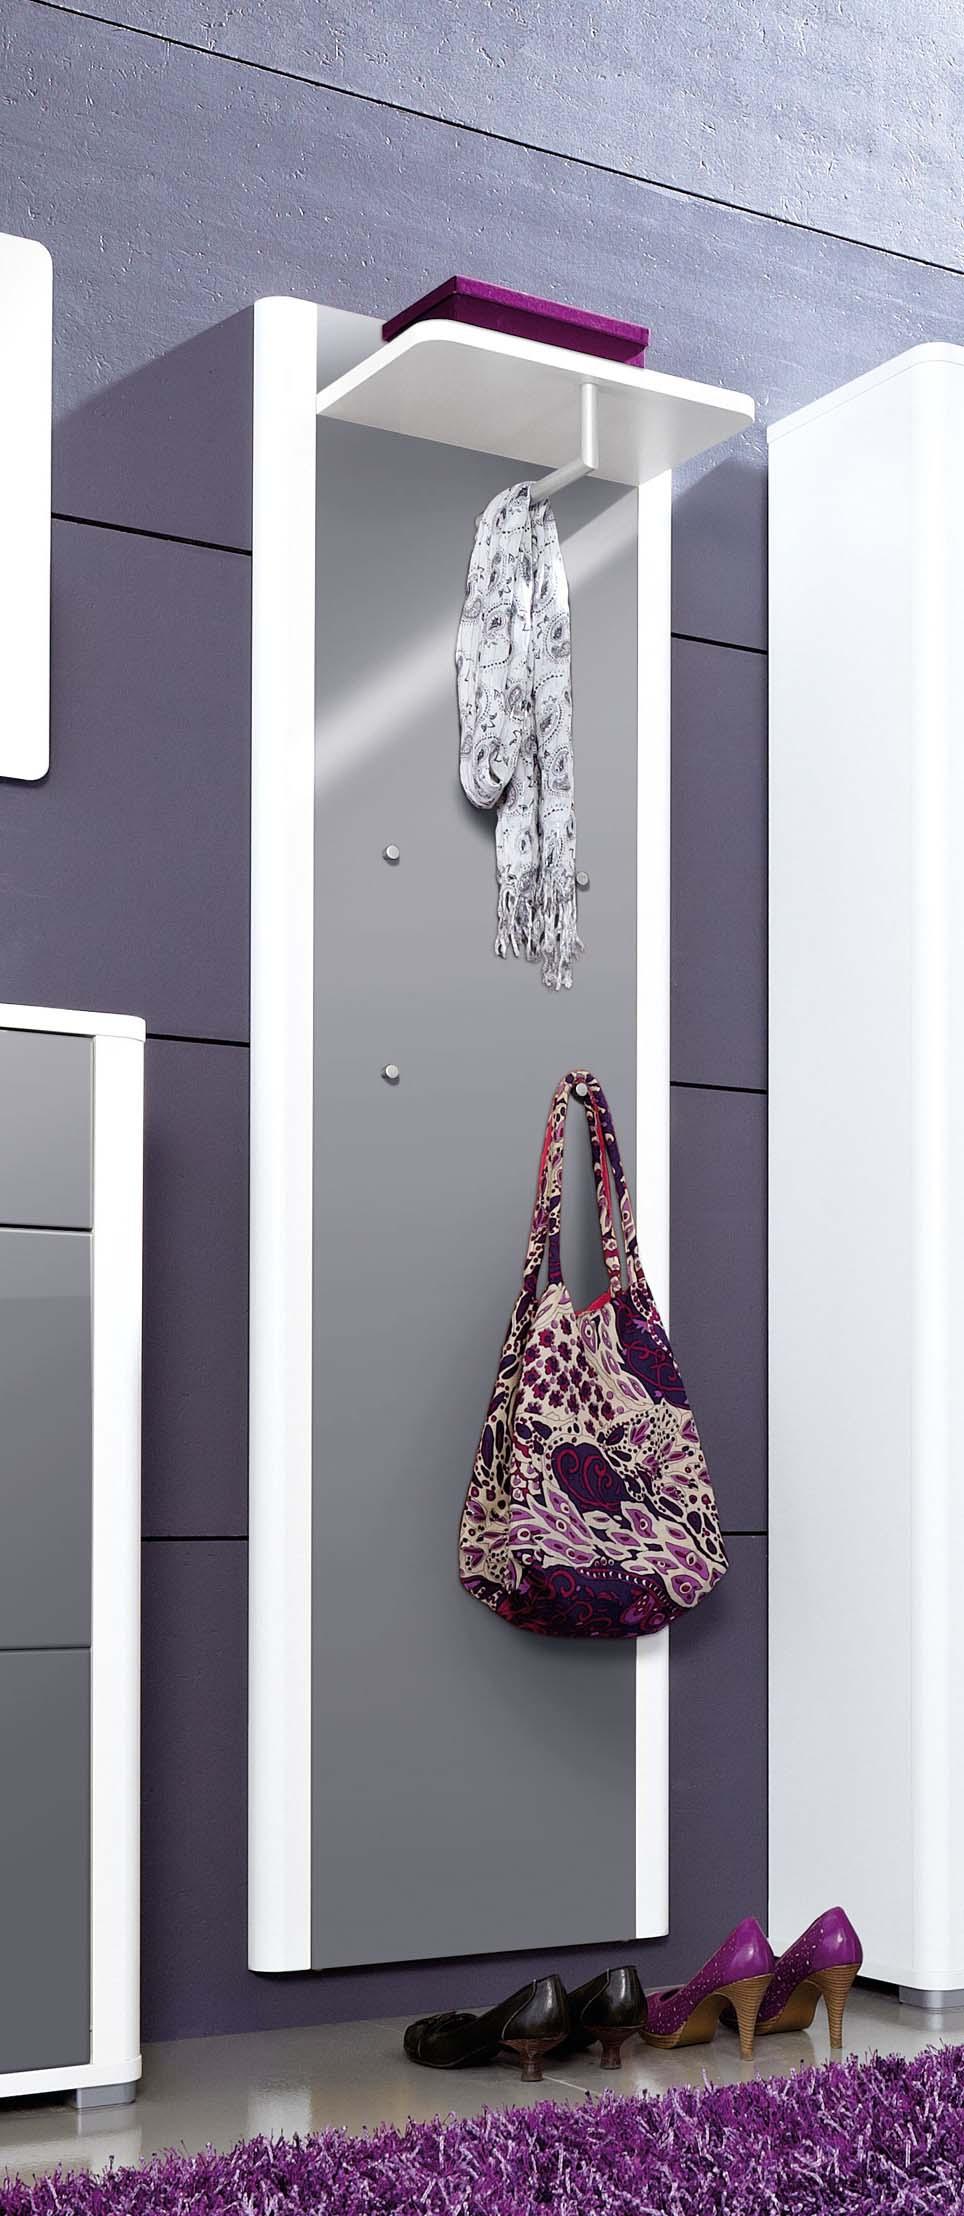 wandgarderobe garderobenpaneel flurgarderobe sonoma eiche weiss grau hochglanz ebay. Black Bedroom Furniture Sets. Home Design Ideas